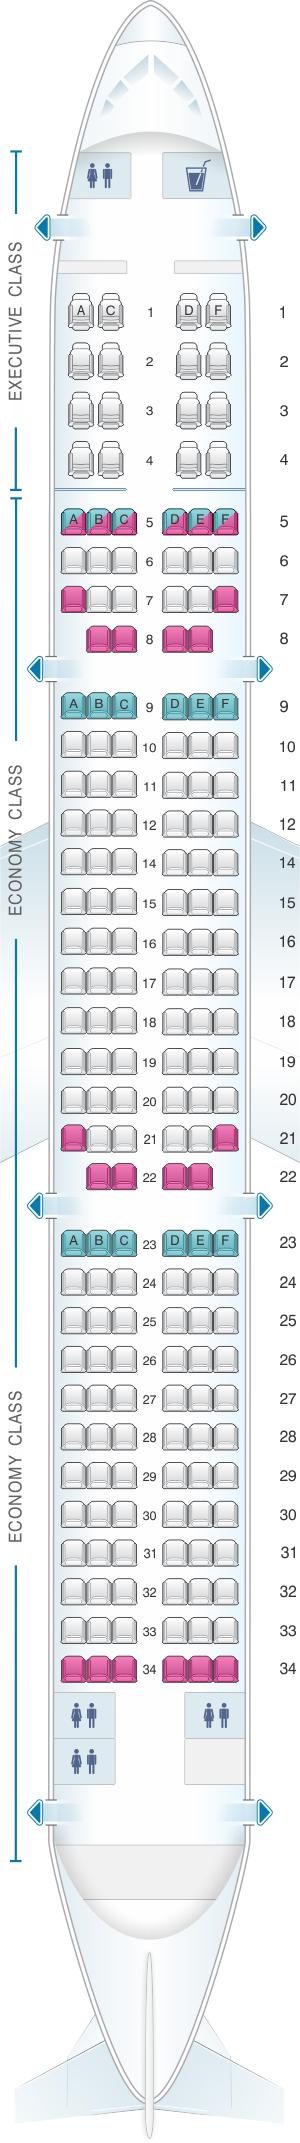 Seat map for SATA Air Açores Airbus A321 neo